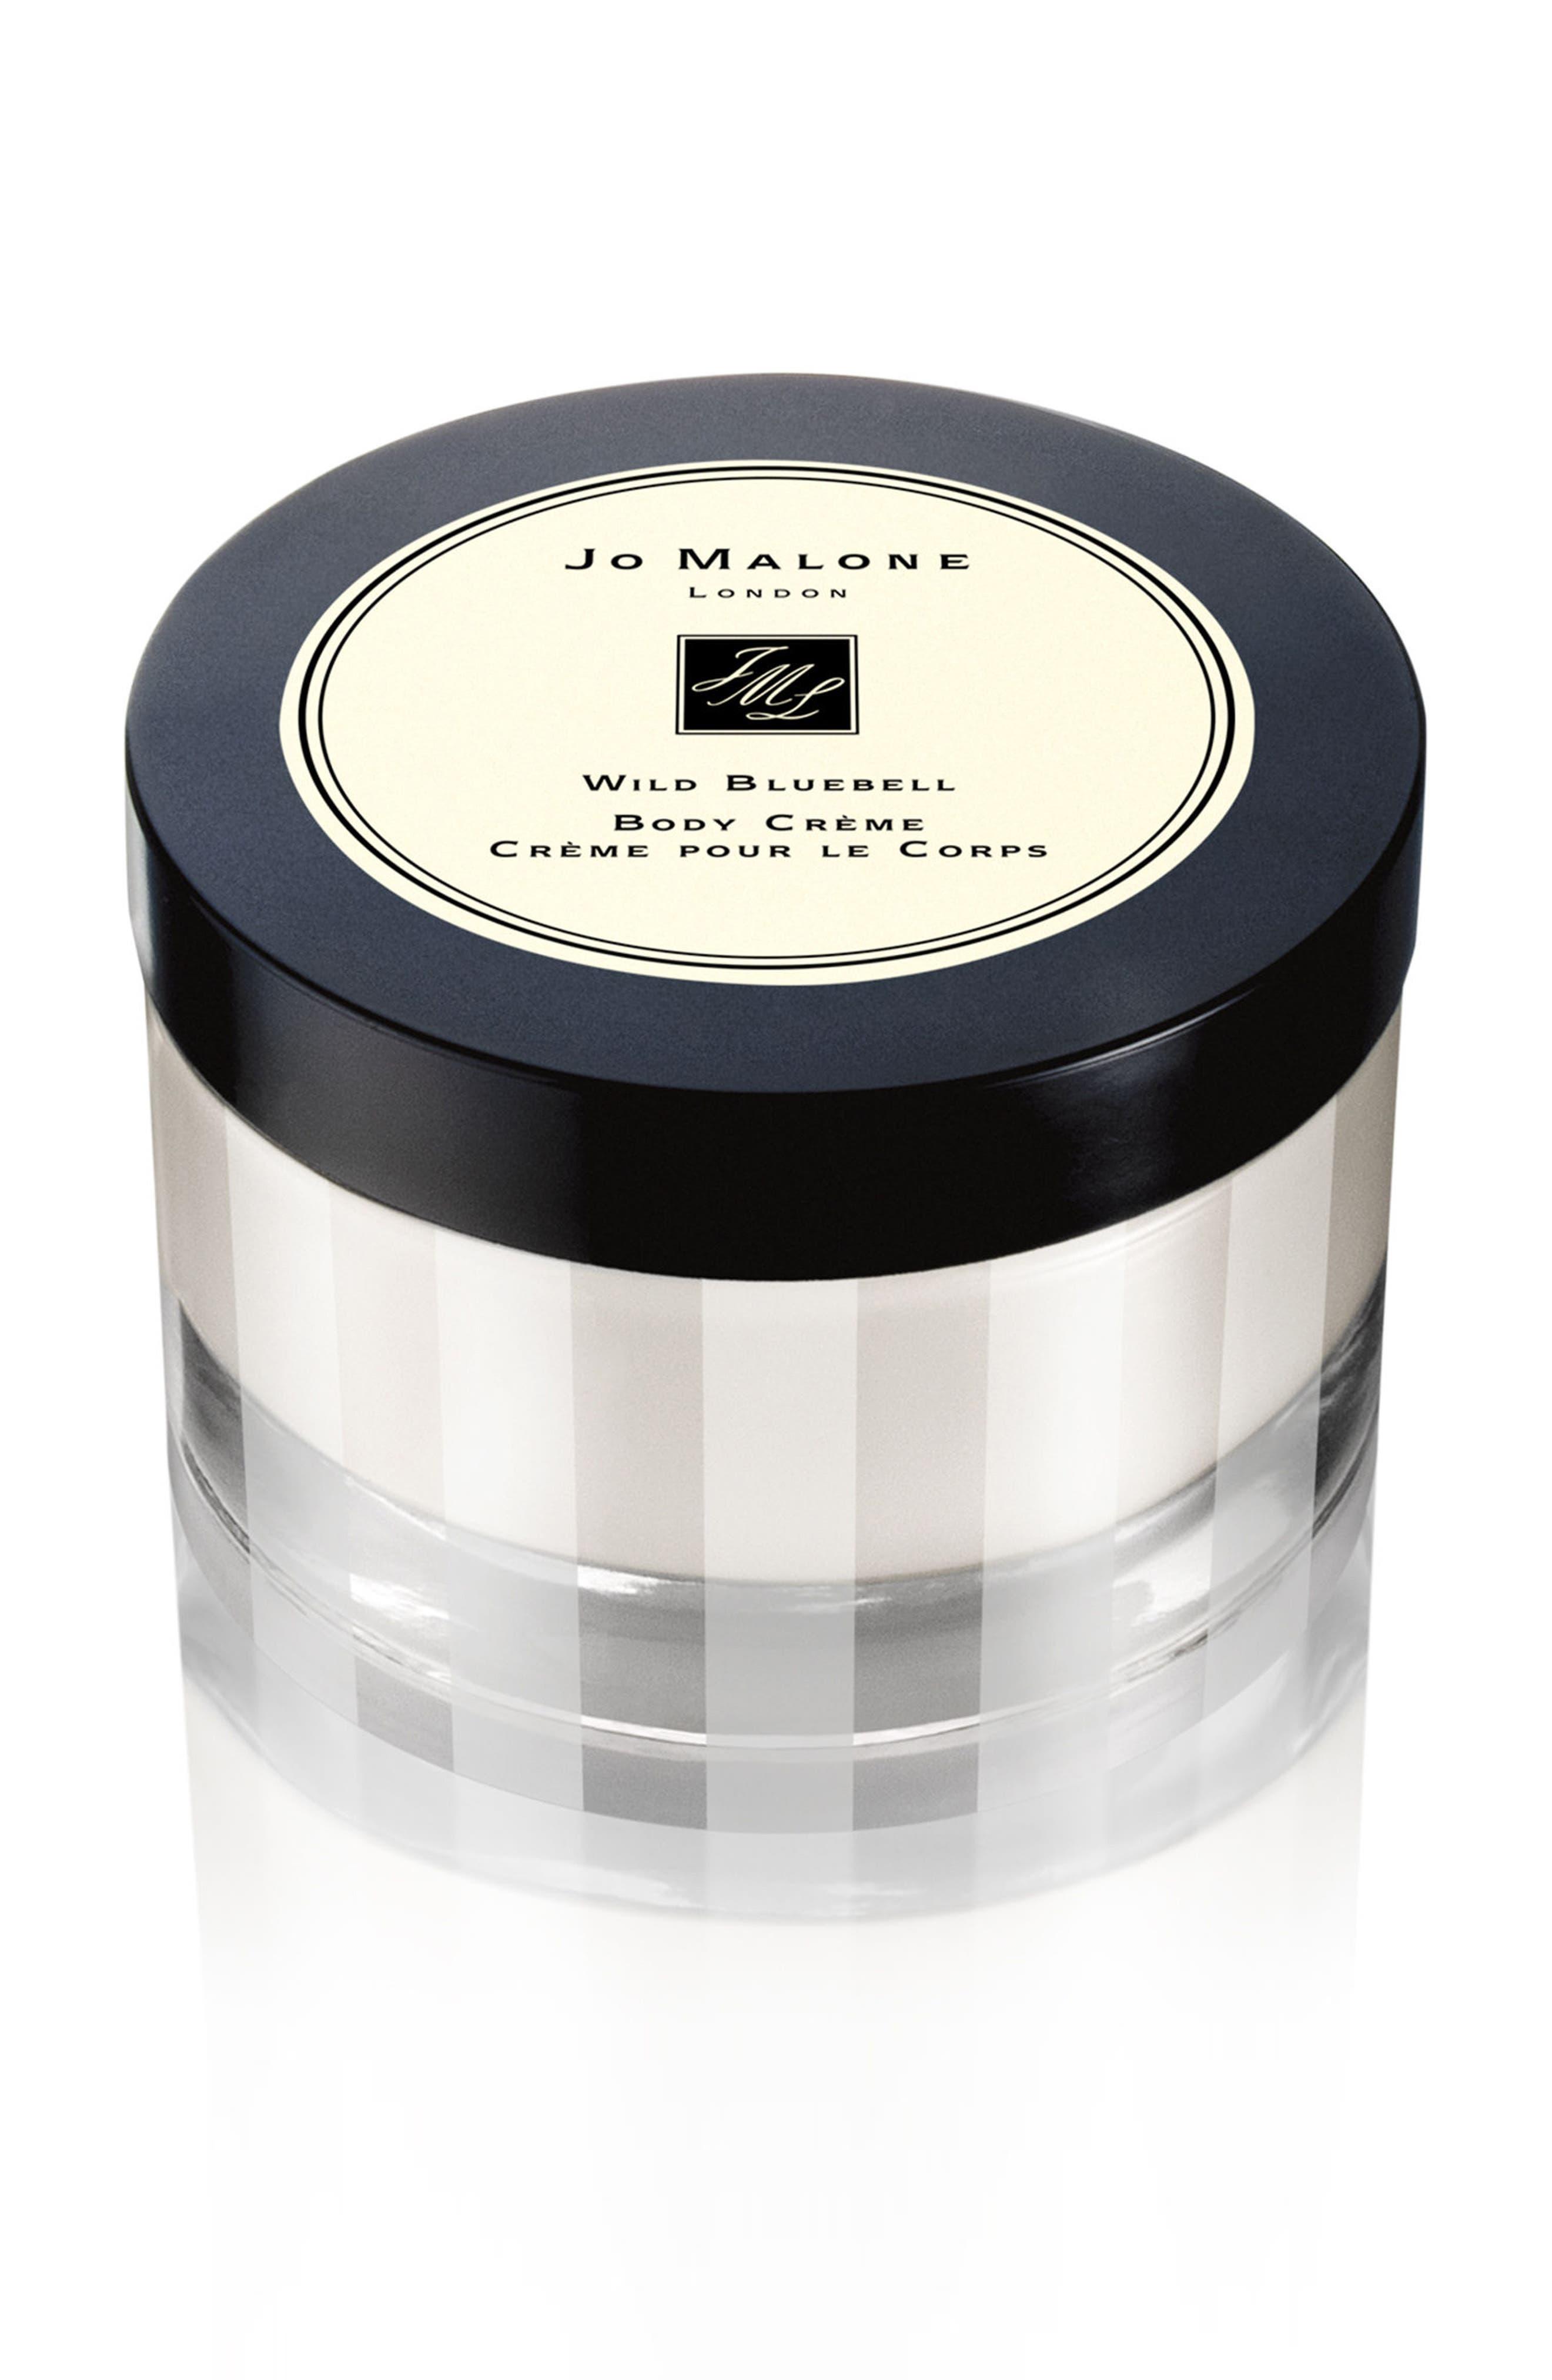 Main Image - Jo Malone London™ Wild Bluebell Body Crème